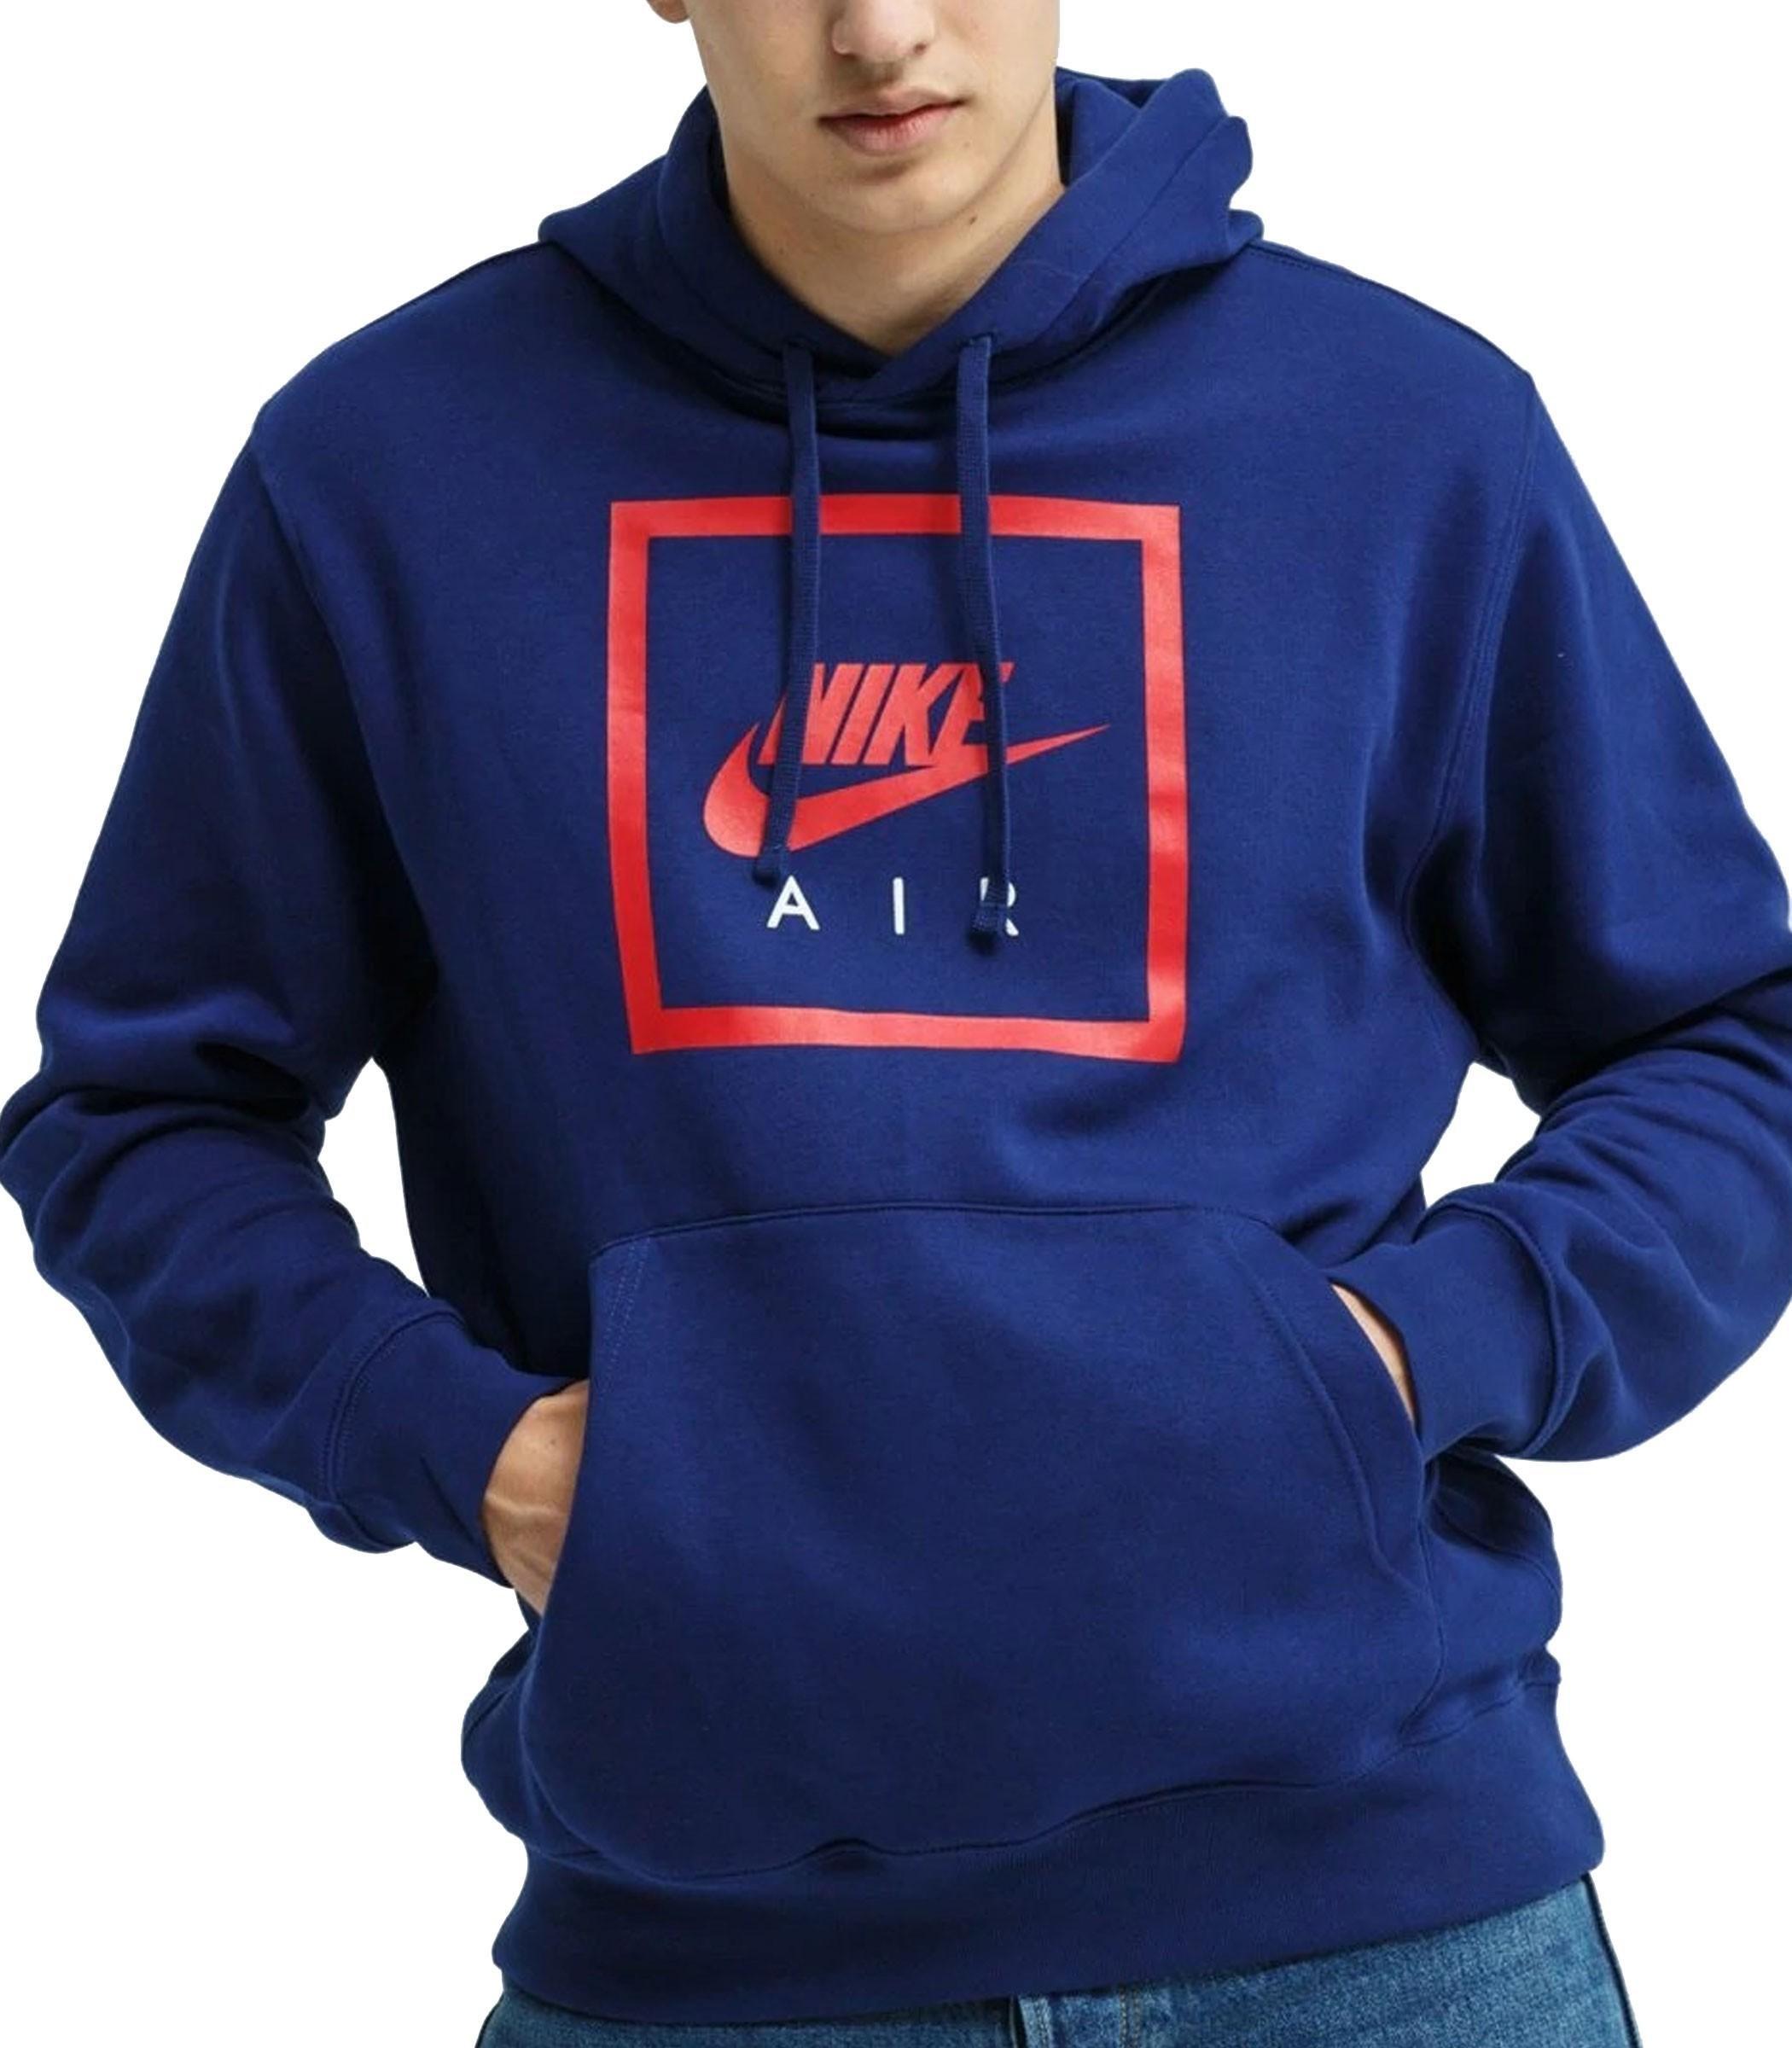 Felpa Uomo Air colore Rosso Blu Nike